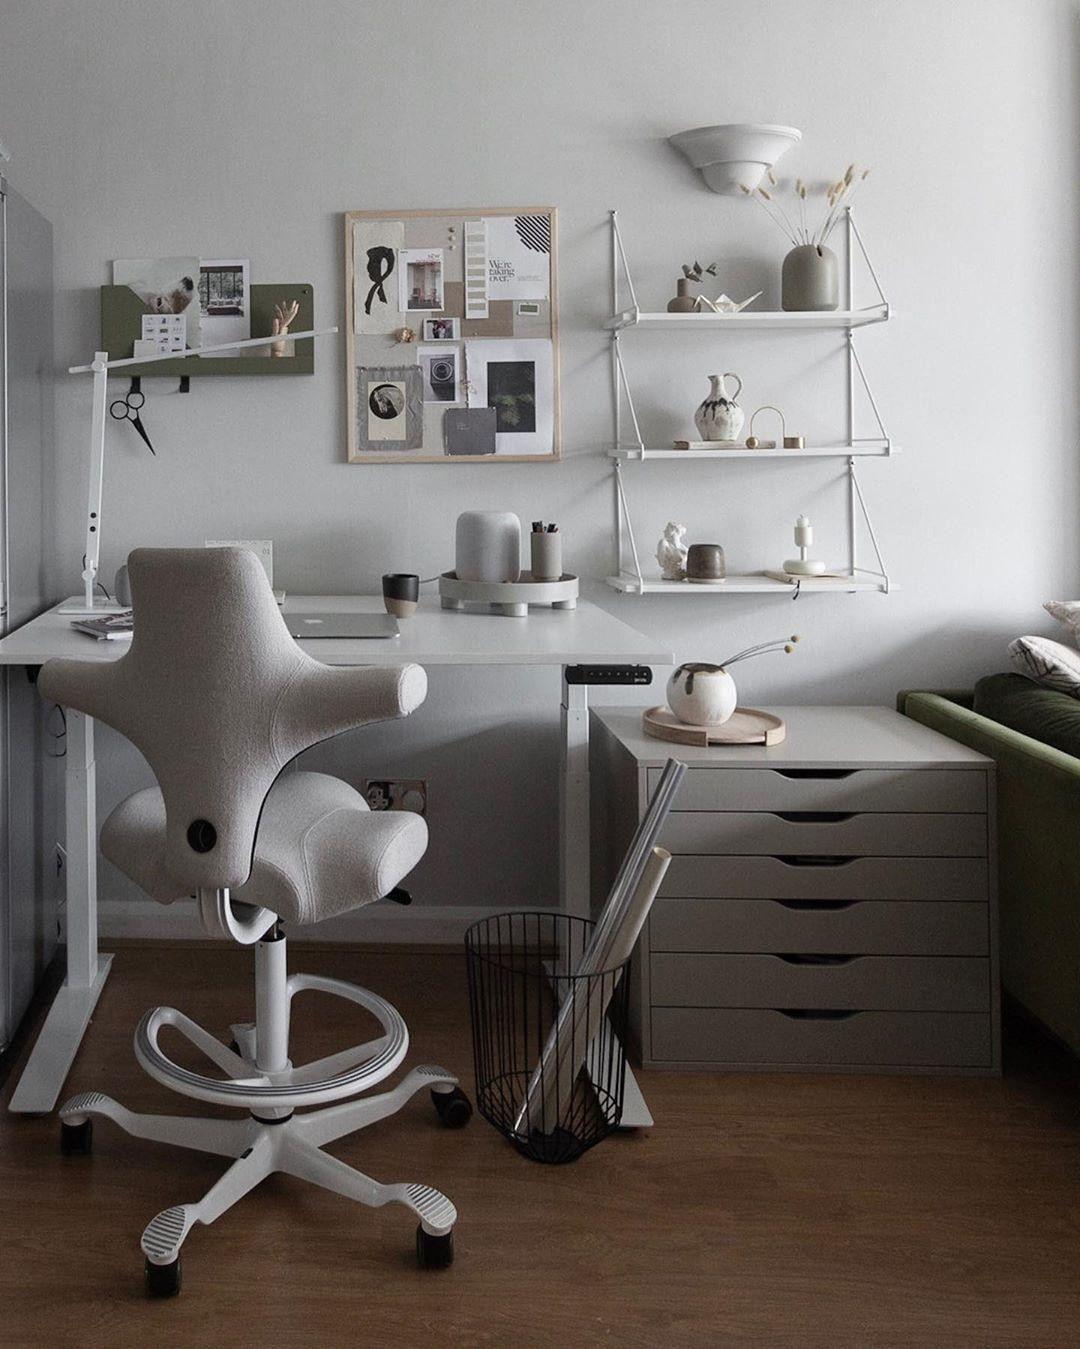 Dreamy Home Office Space With Scandinavian Design Chair Hag Capisco Flokk Design In 2020 Office Chair Design Home Office Chairs Home Office Space